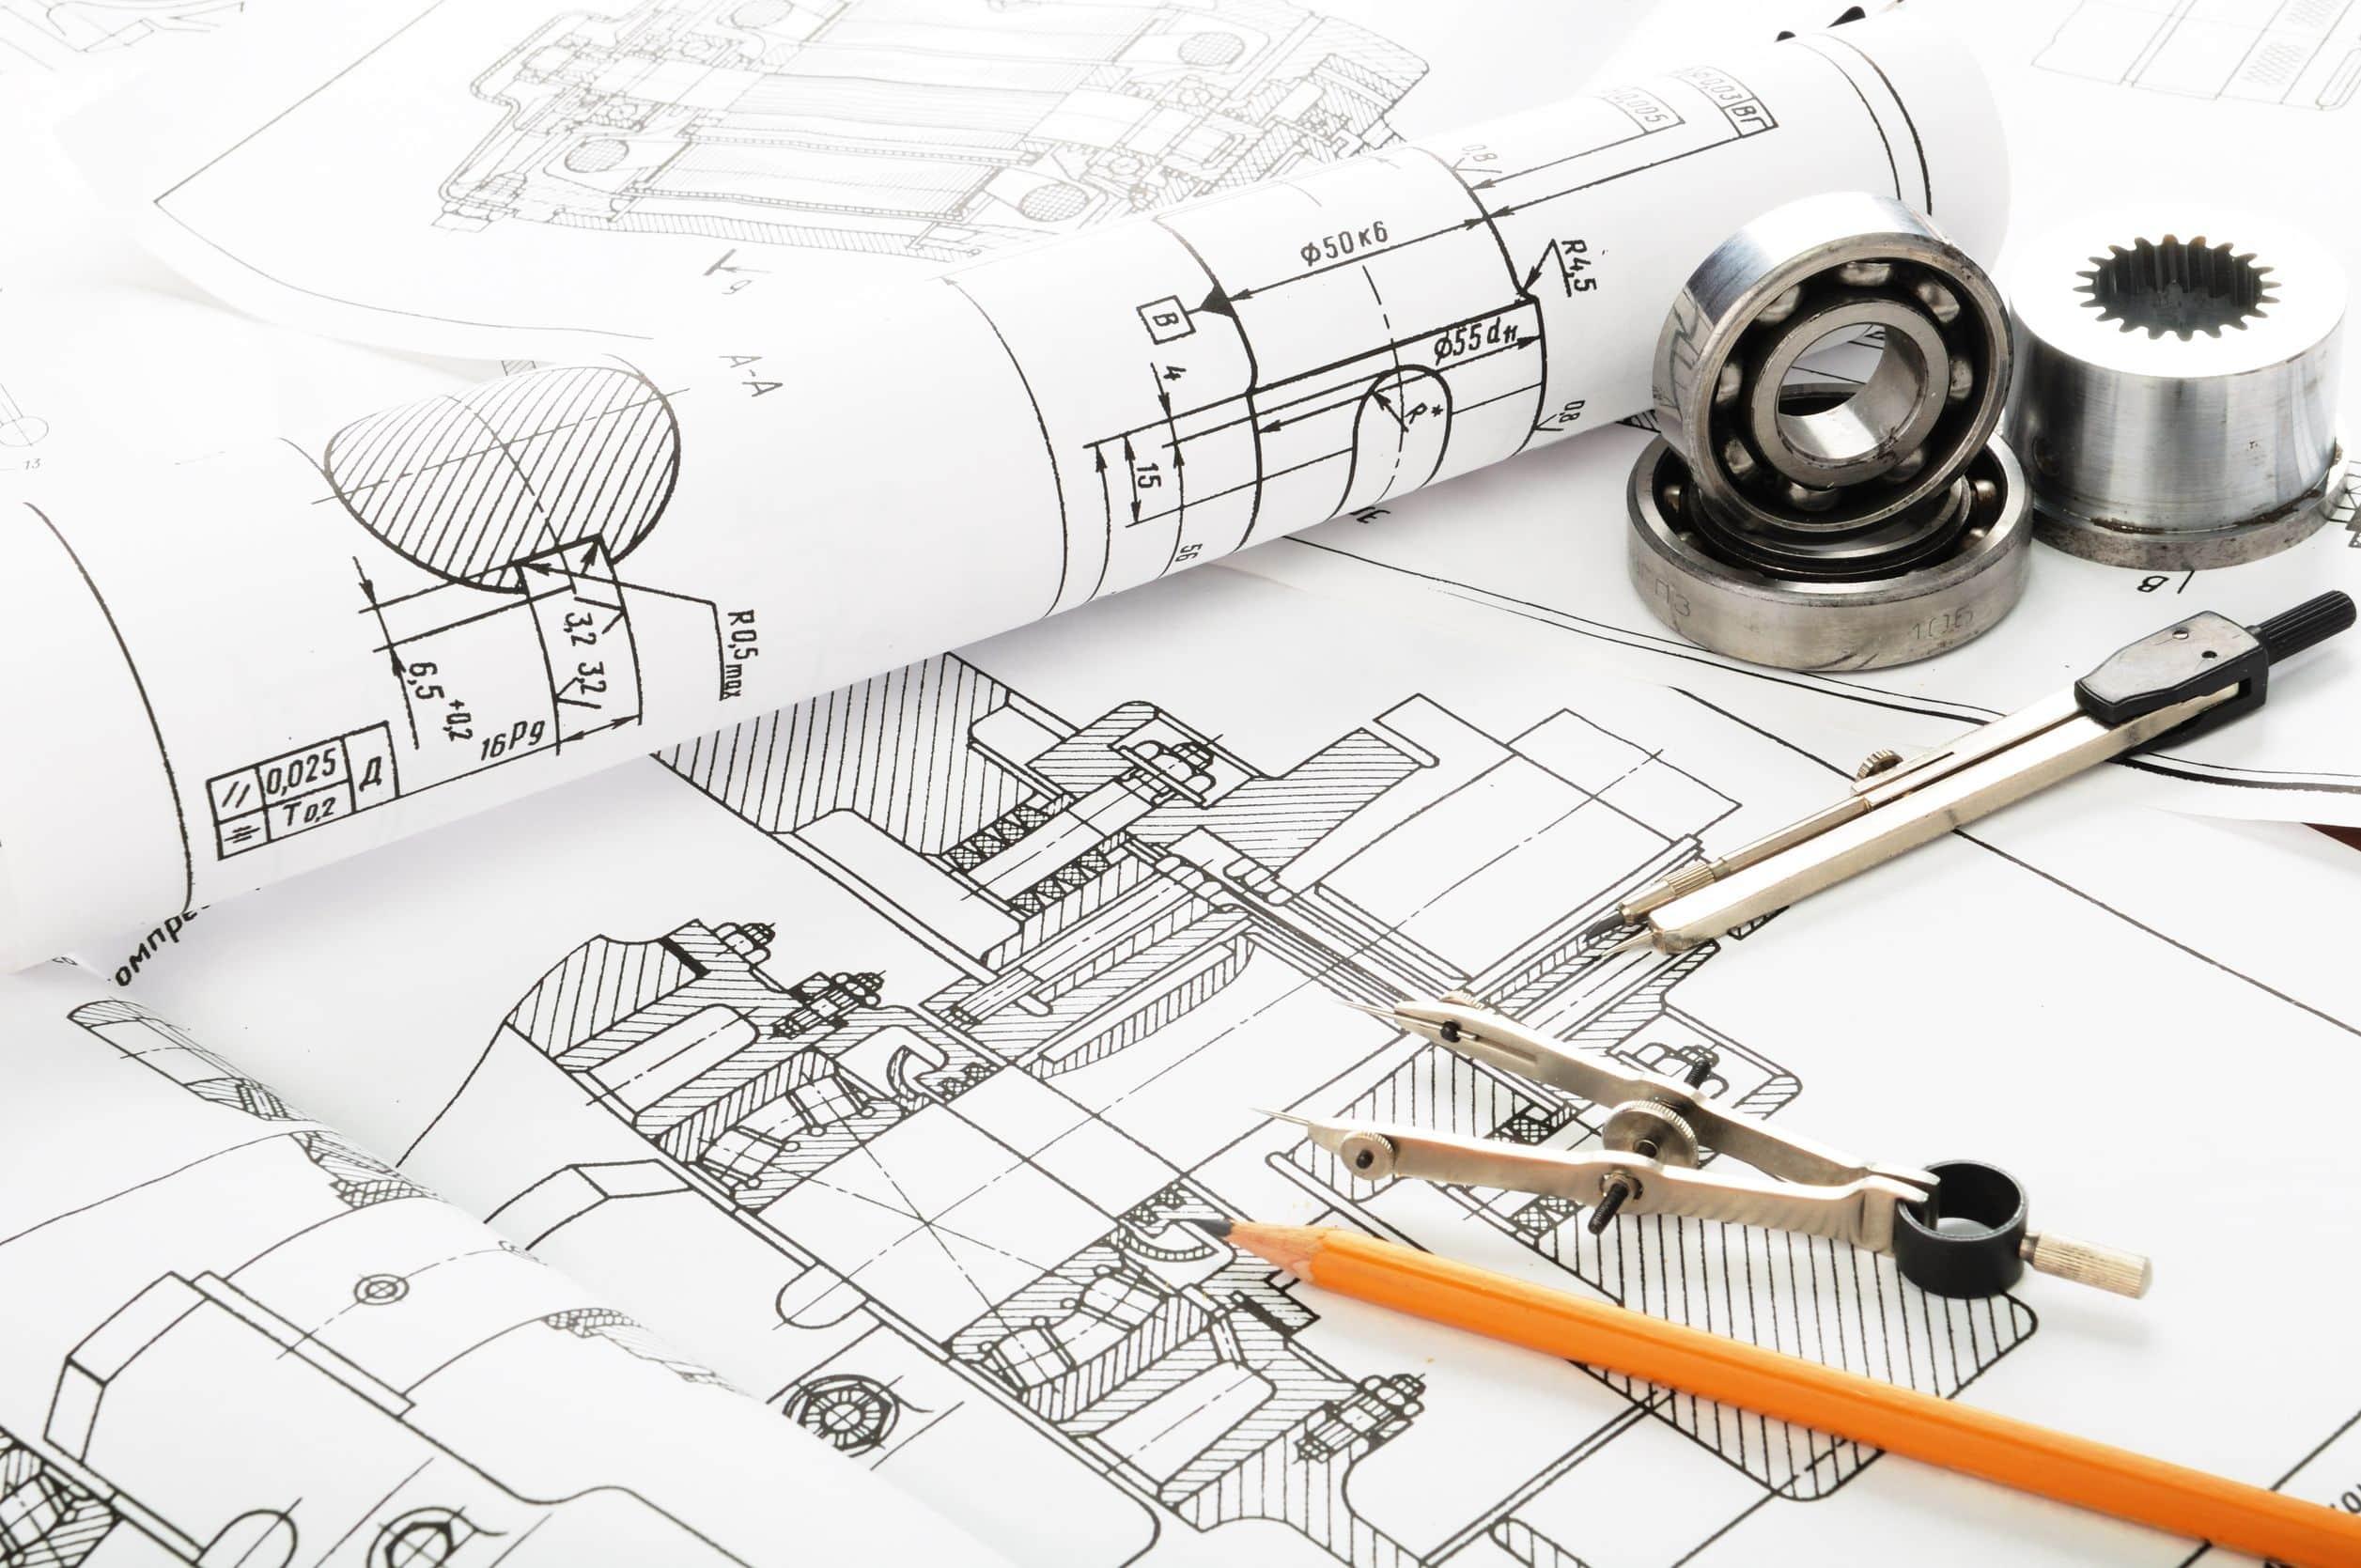 Permanent Sketch Book: Permanent Vs Contract For Quantity Surveyor Professionals